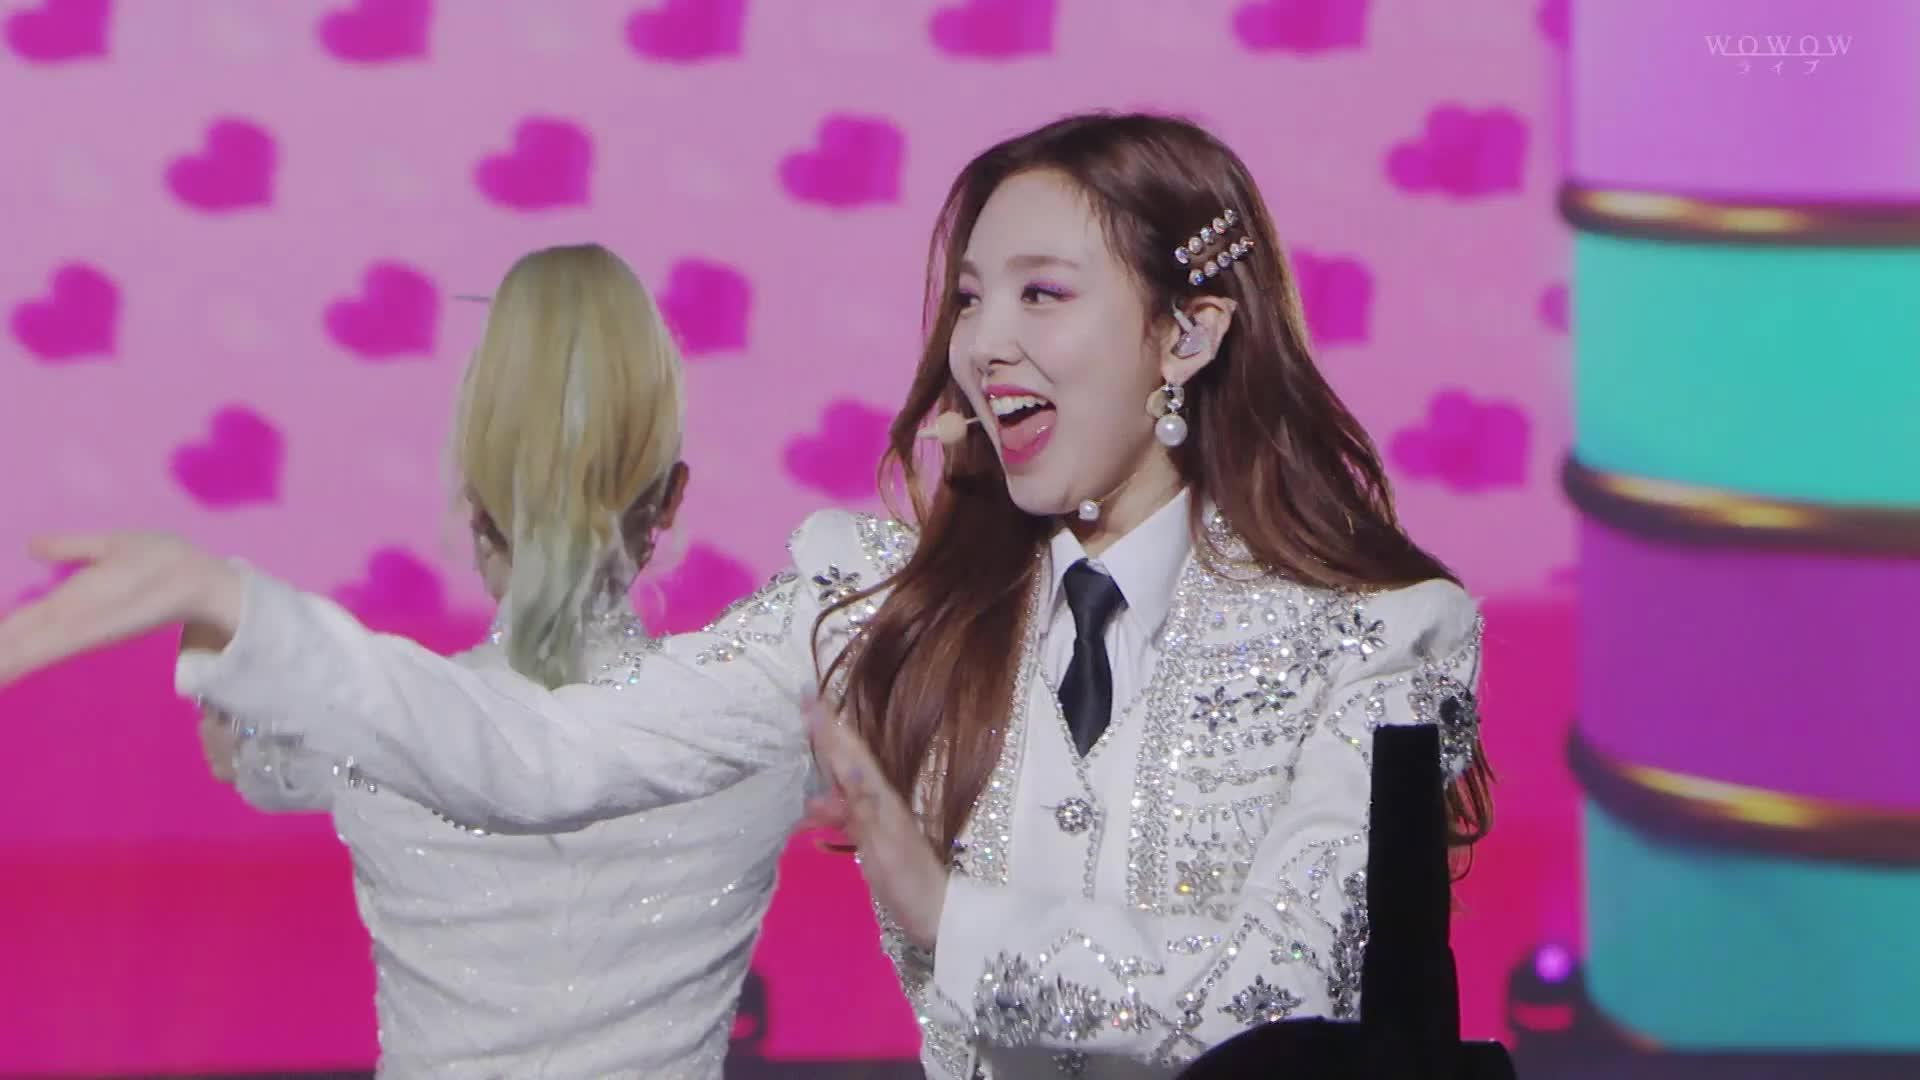 dreamday, Nayeon getting a big hug from Sana and Jeongyeon GIFs